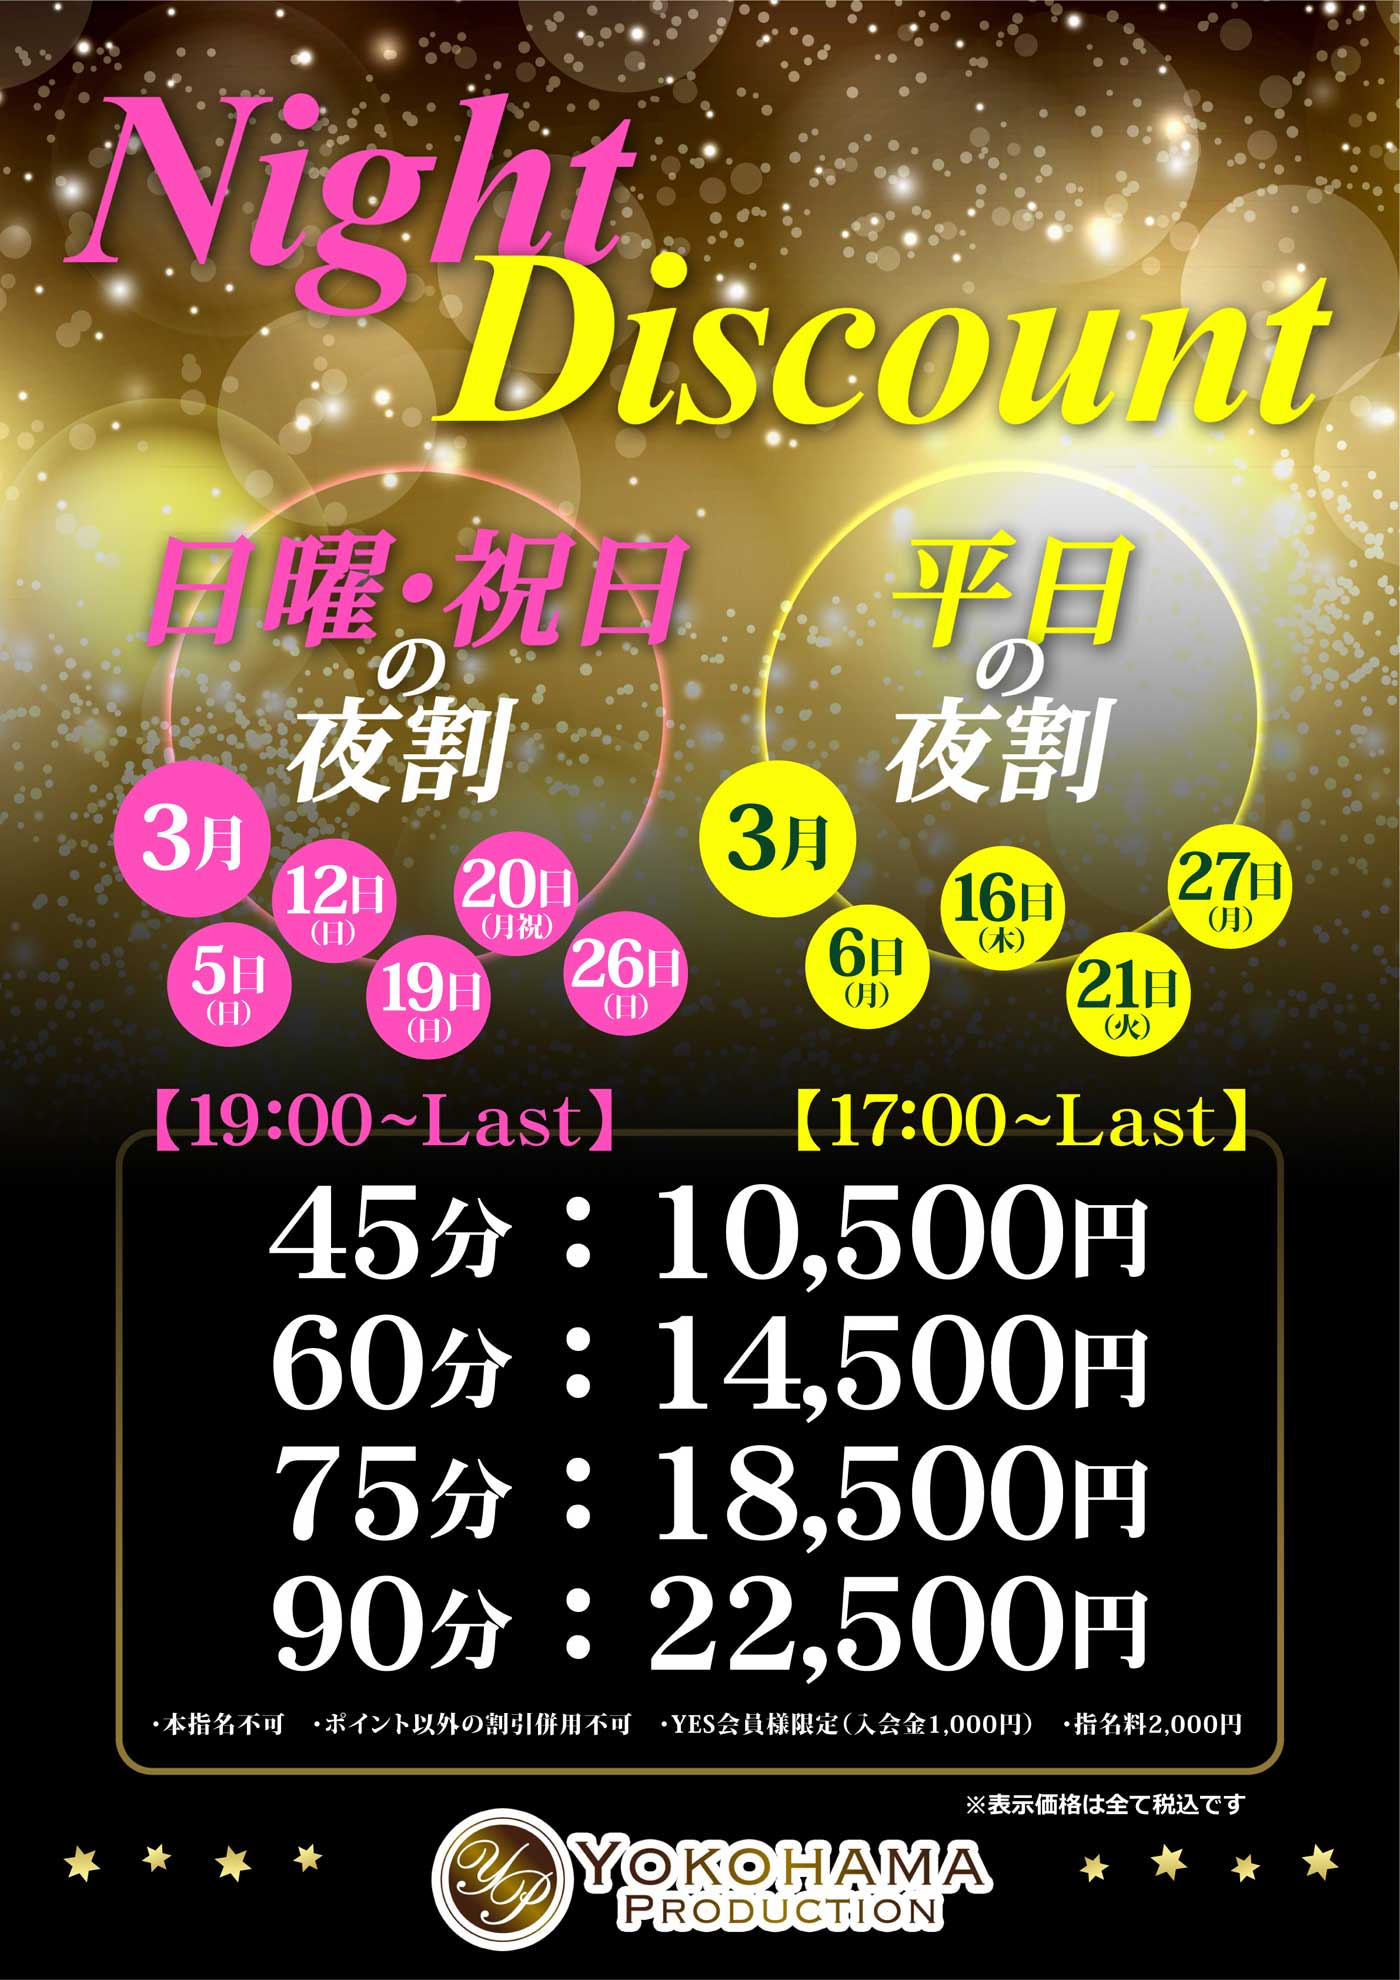 ★Weekday Night Discount~平日の夜割~★